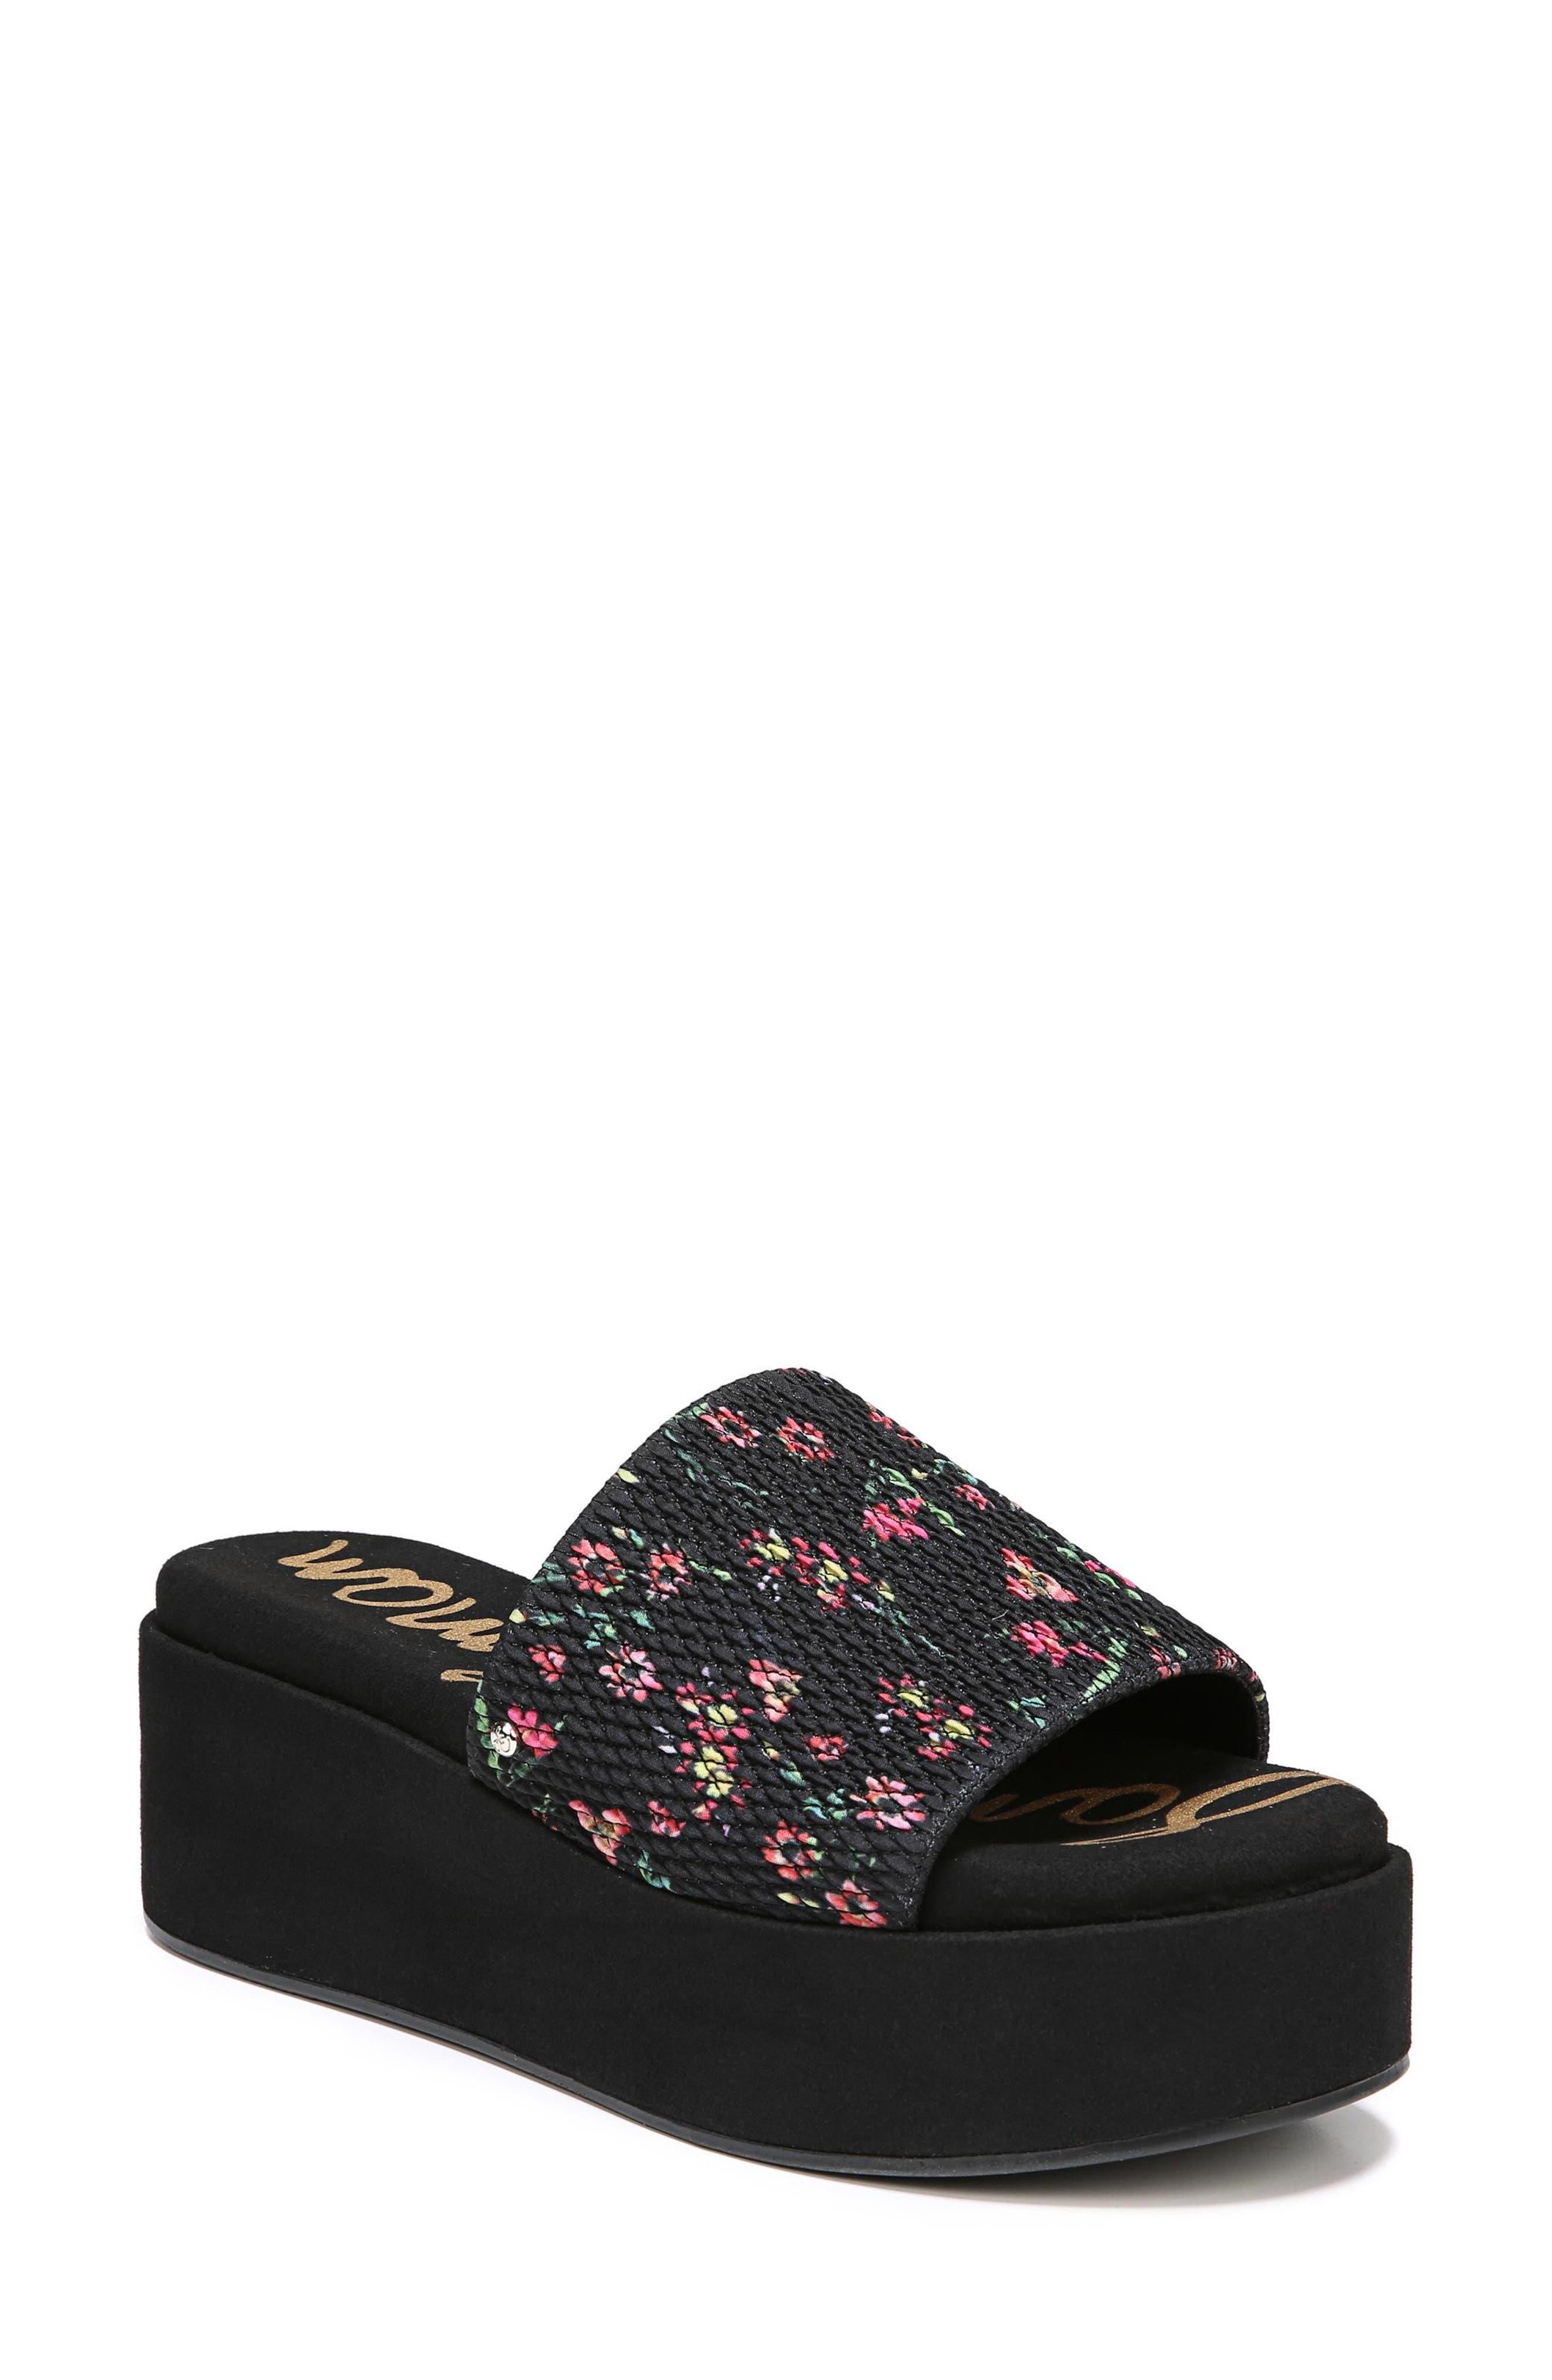 Wendi Platform Slide Sandal,                             Main thumbnail 1, color,                             001